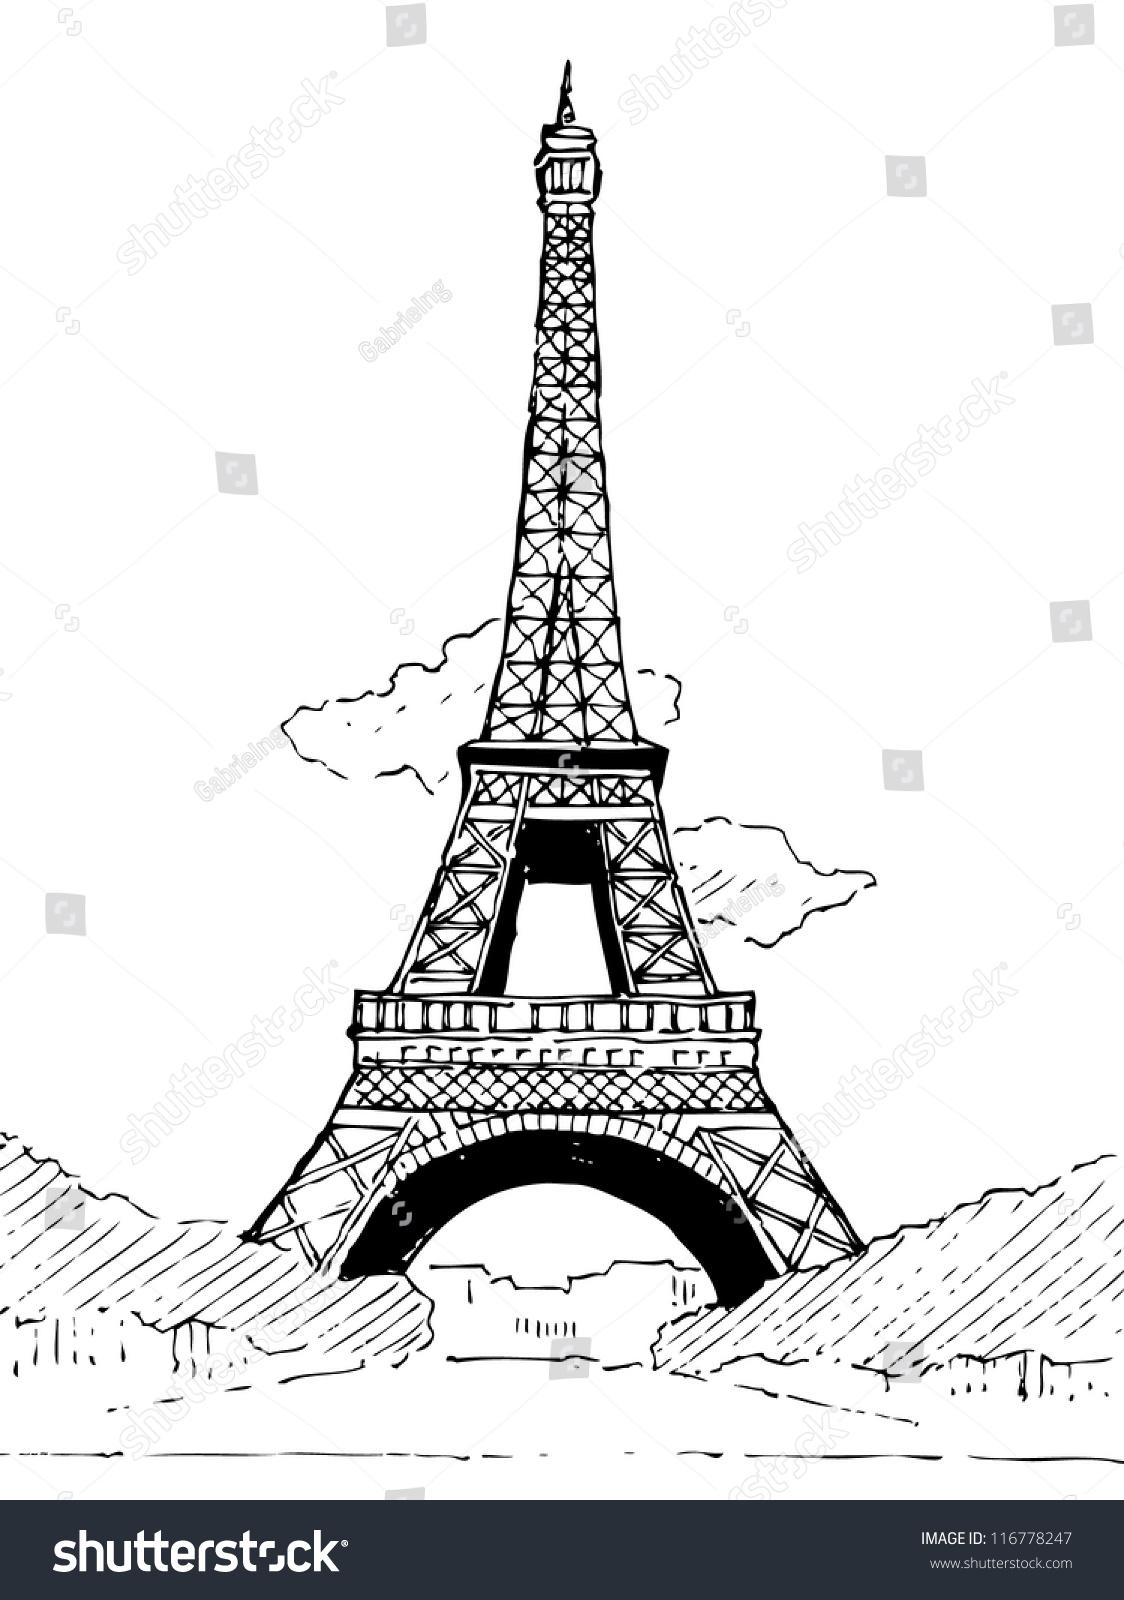 Eiffel Tower Doodle Vector Stock Vector 116778247 ...